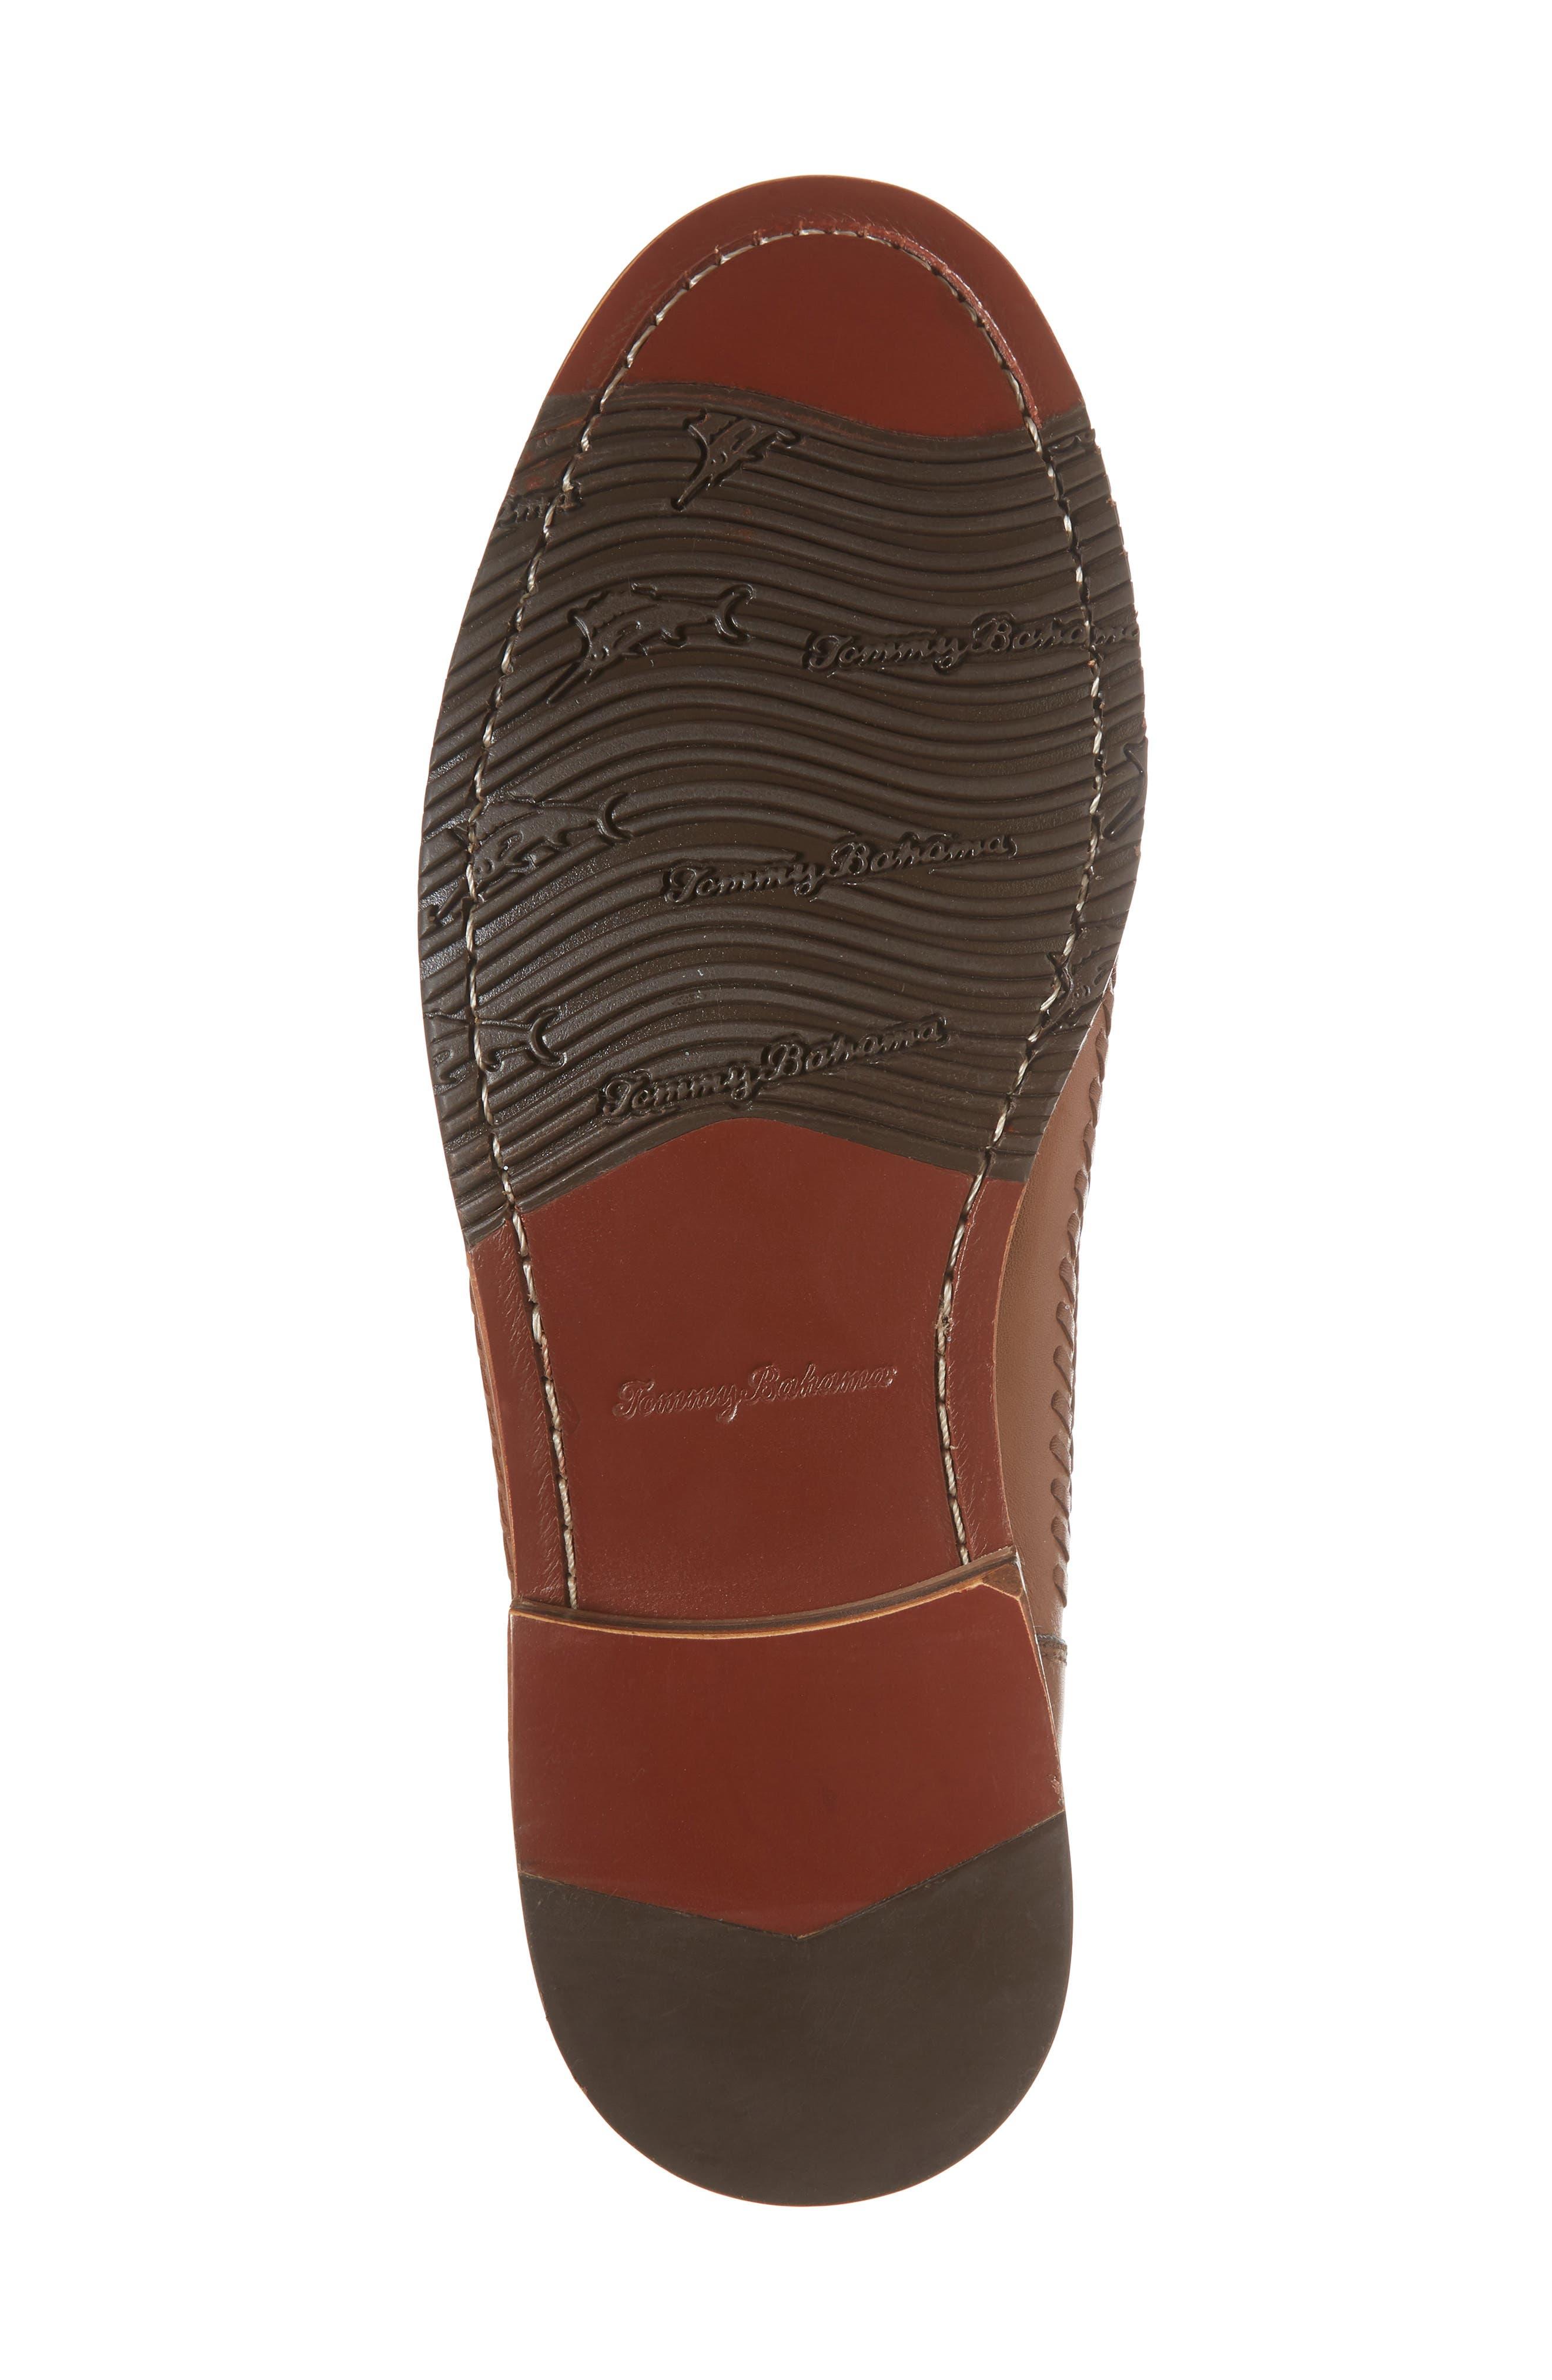 Hasslington Woven Venetian Loafer,                             Alternate thumbnail 6, color,                             Tan Leather